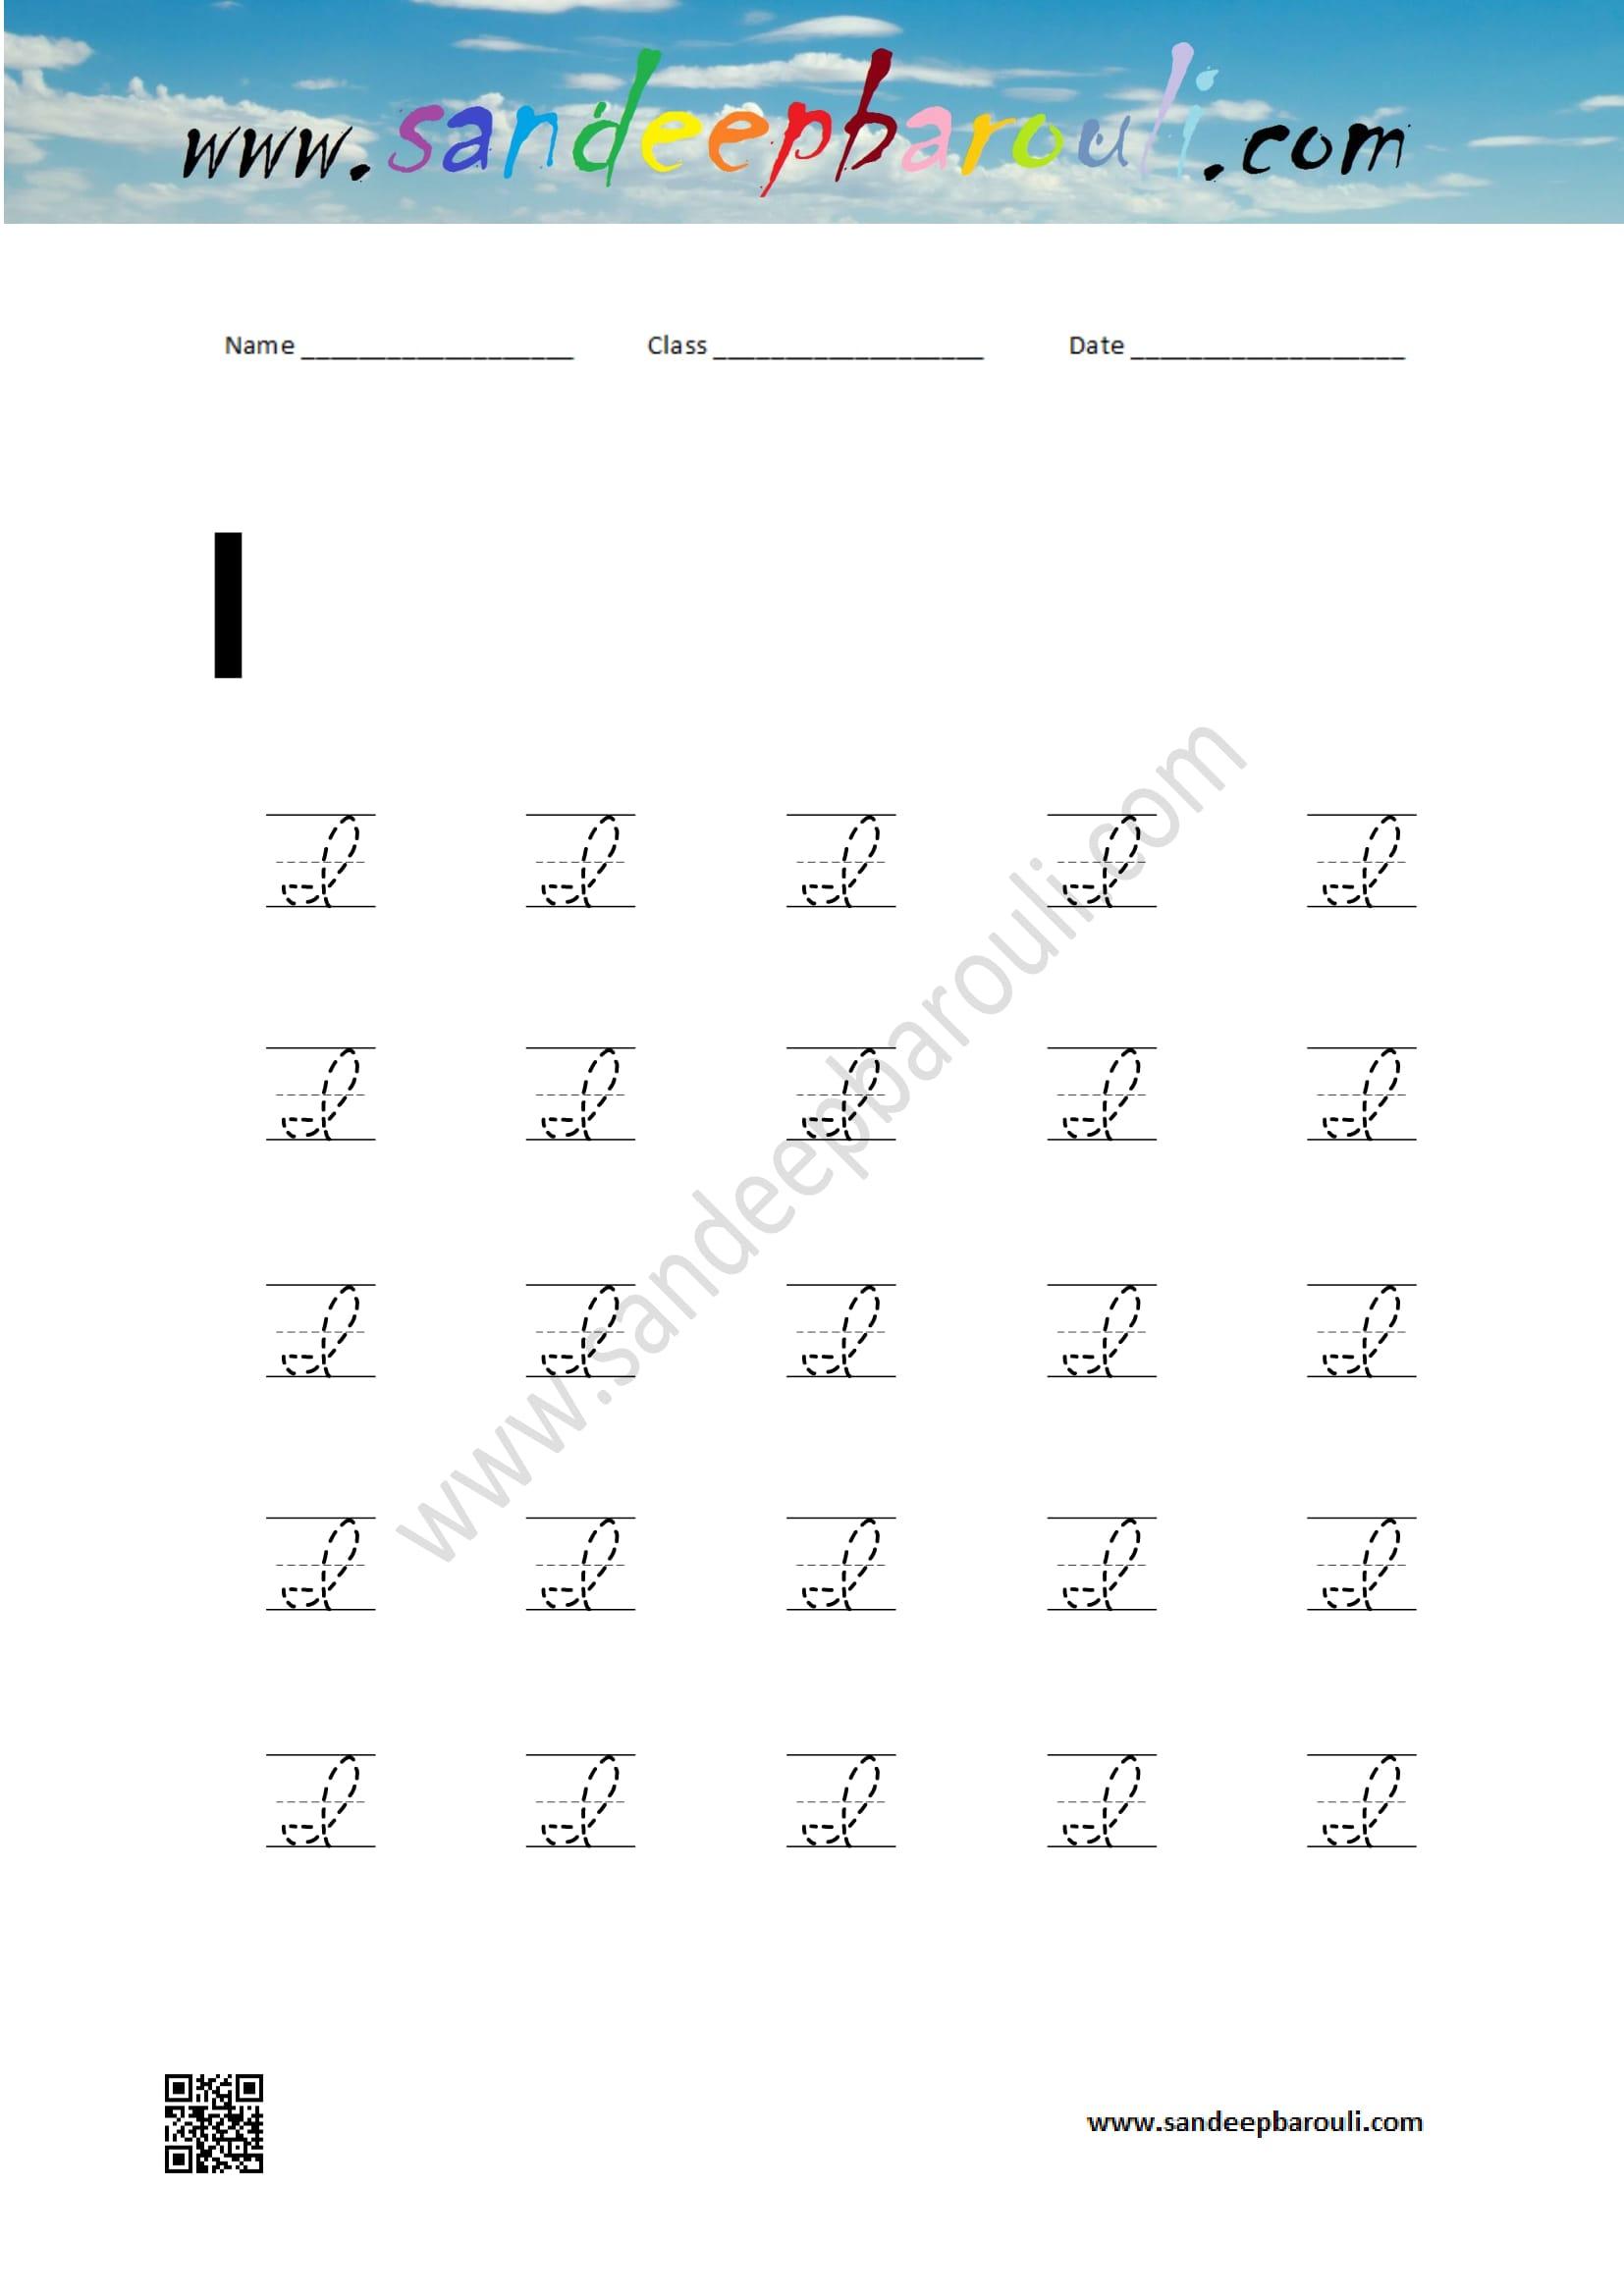 Cursive Writing Worksheet For I Sandeepbarouli